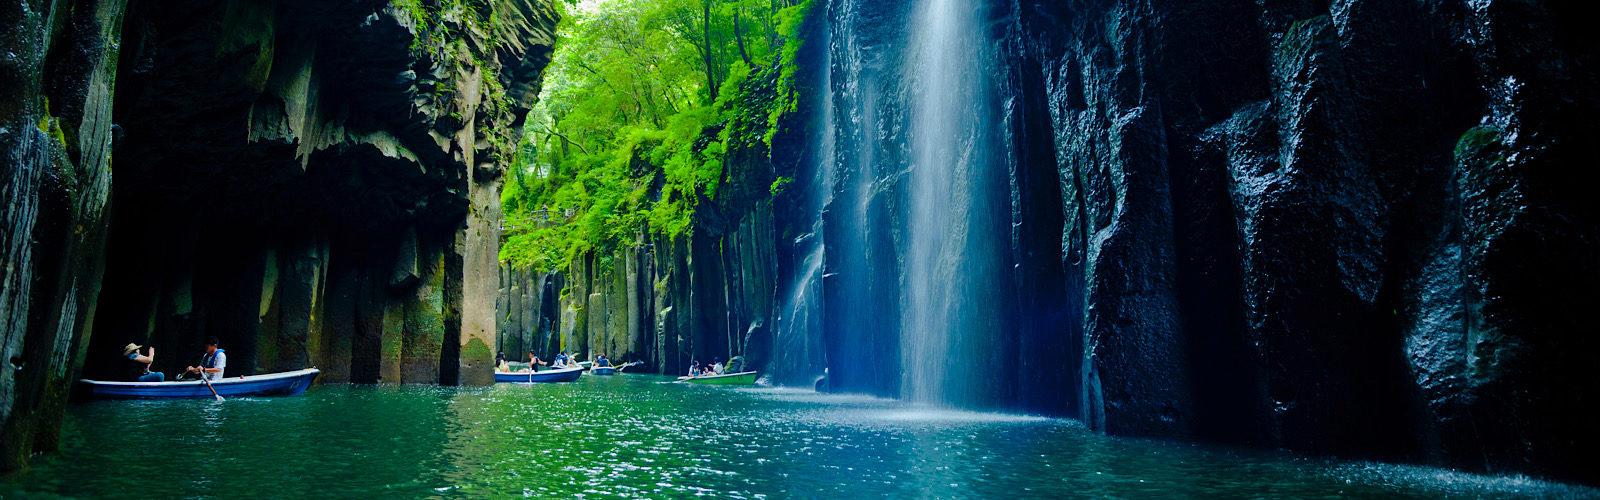 Luxury in Nature Series